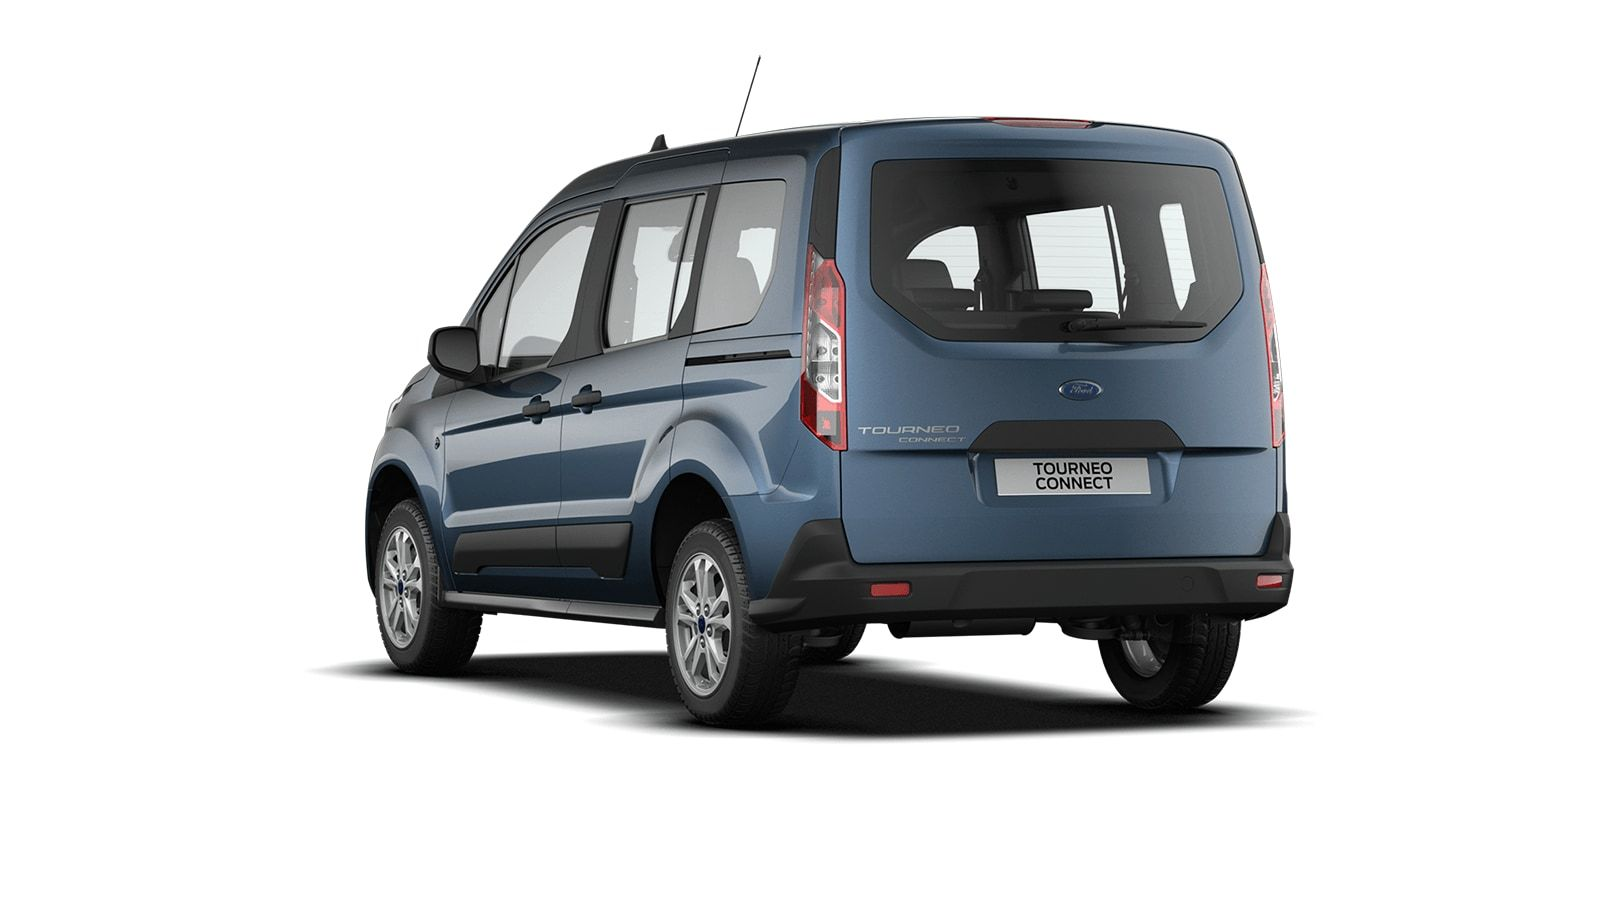 "Nieuw Ford Tourneo connect v408 Tourneo - Trend - 1.5 Duratorq TDCi 120ps / 88kW (270Nm) A8 US5 - Niet-metaalkleur ""Frozen White"" 2"